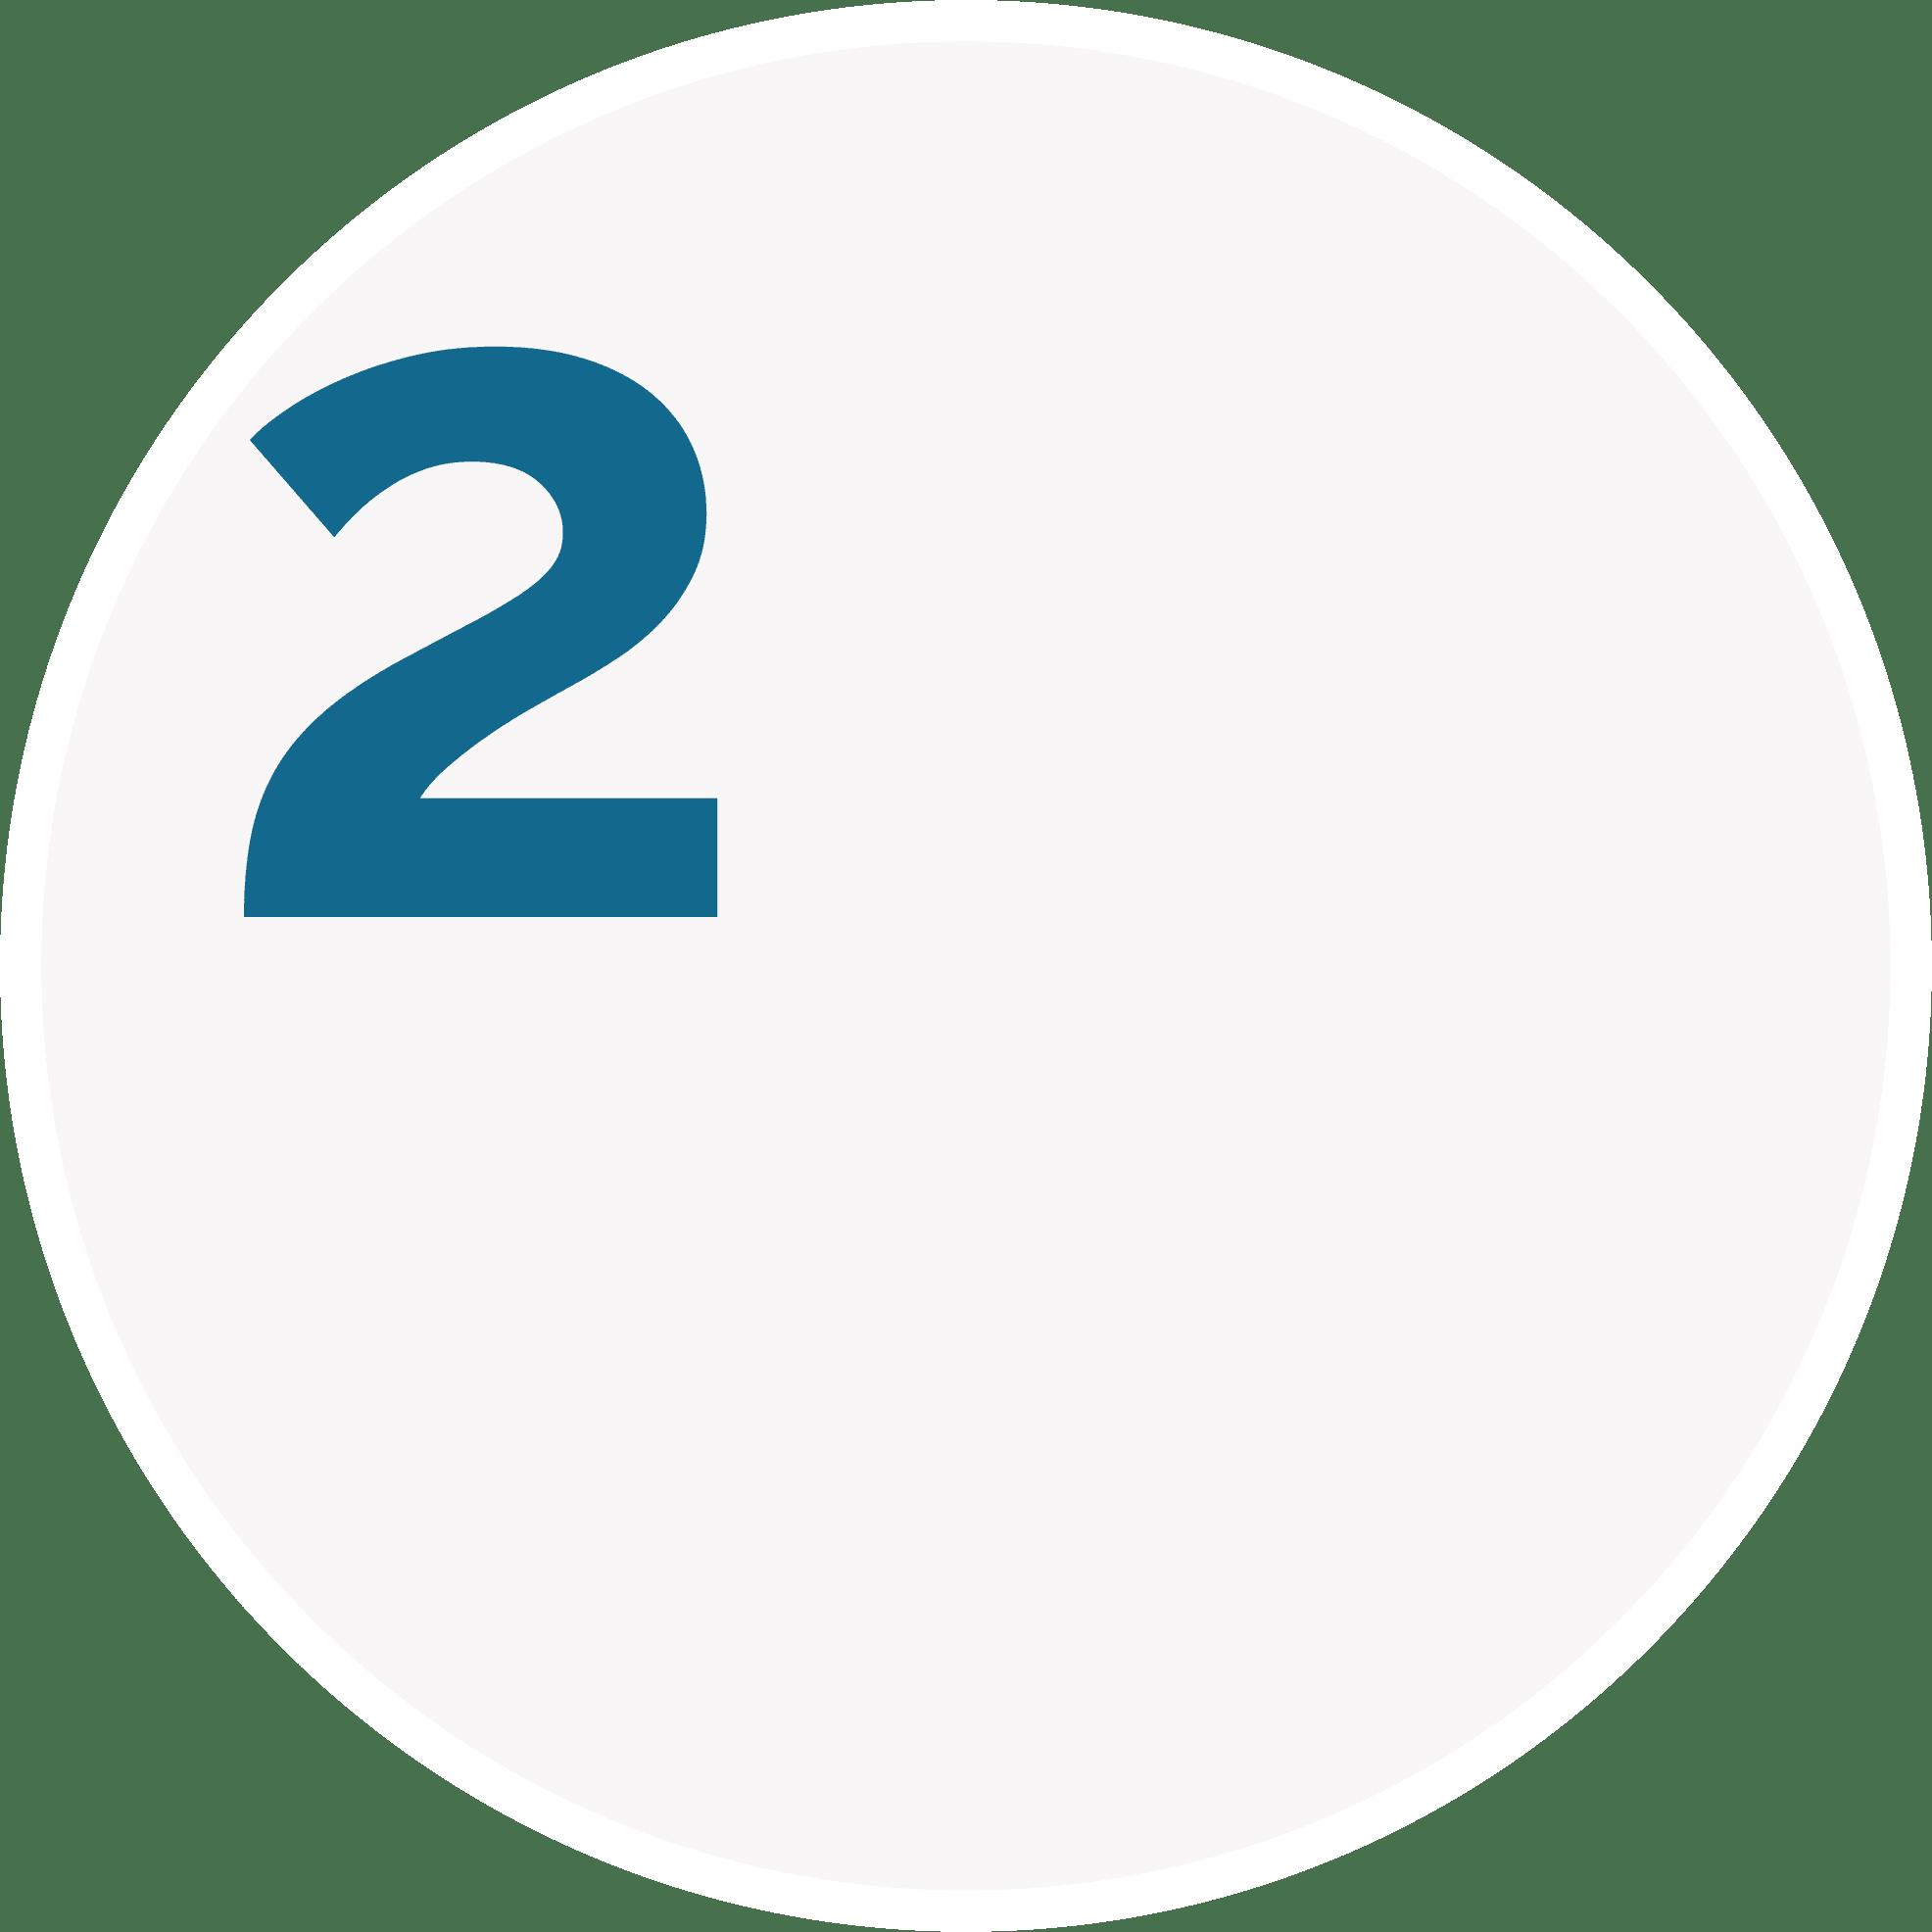 2 3 - Home